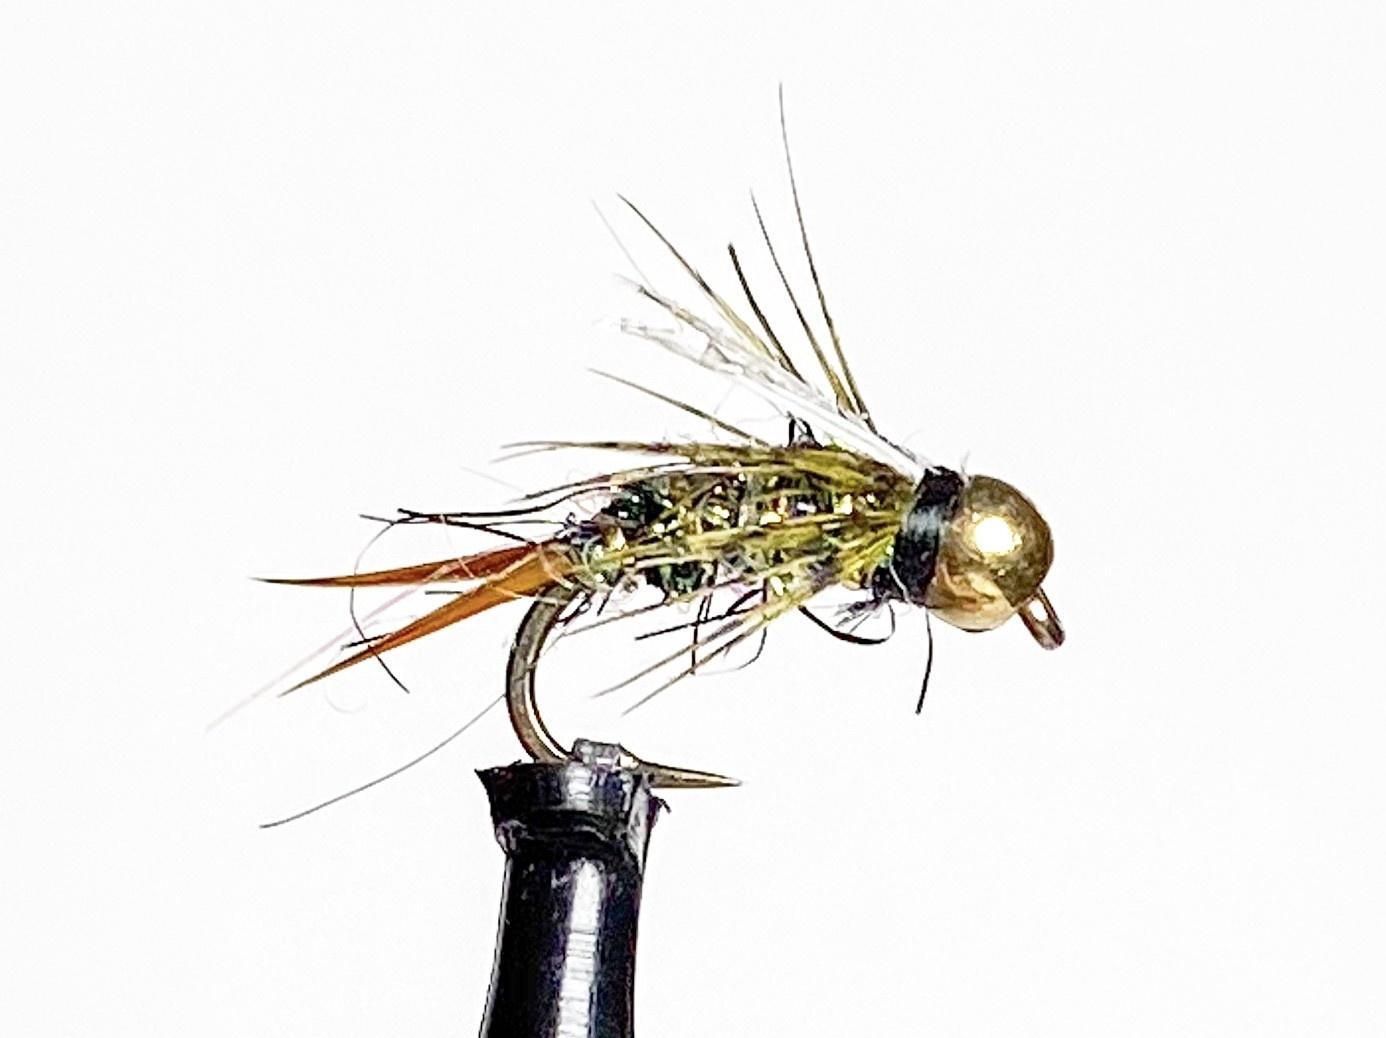 Solitude Flies Beadhead Flash Prince Olive size 14